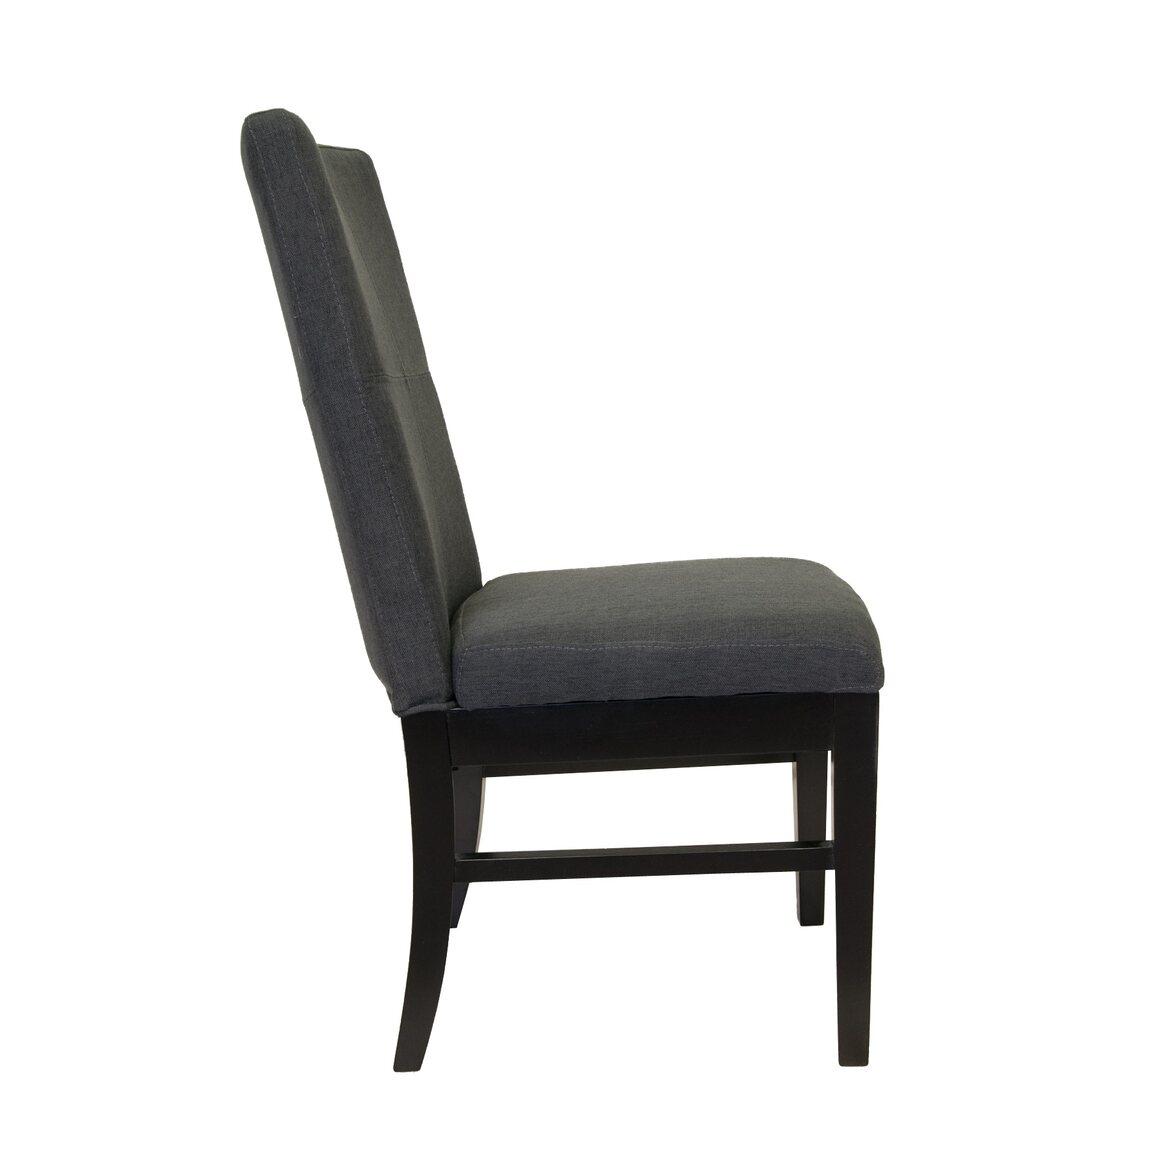 Стул Deng grey 2   Обеденные стулья Kingsby